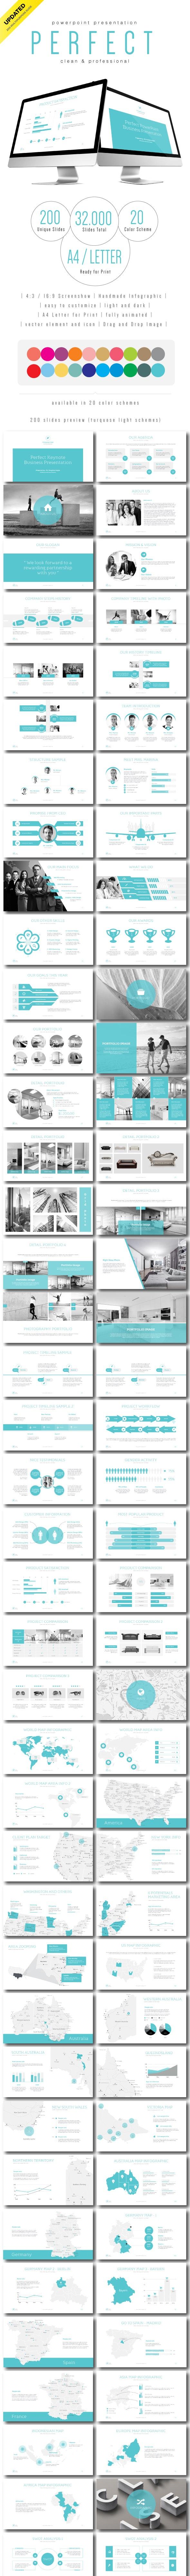 Multipurpose PowerPoint Presentation (Vol. 10) - Business PowerPoint Templates